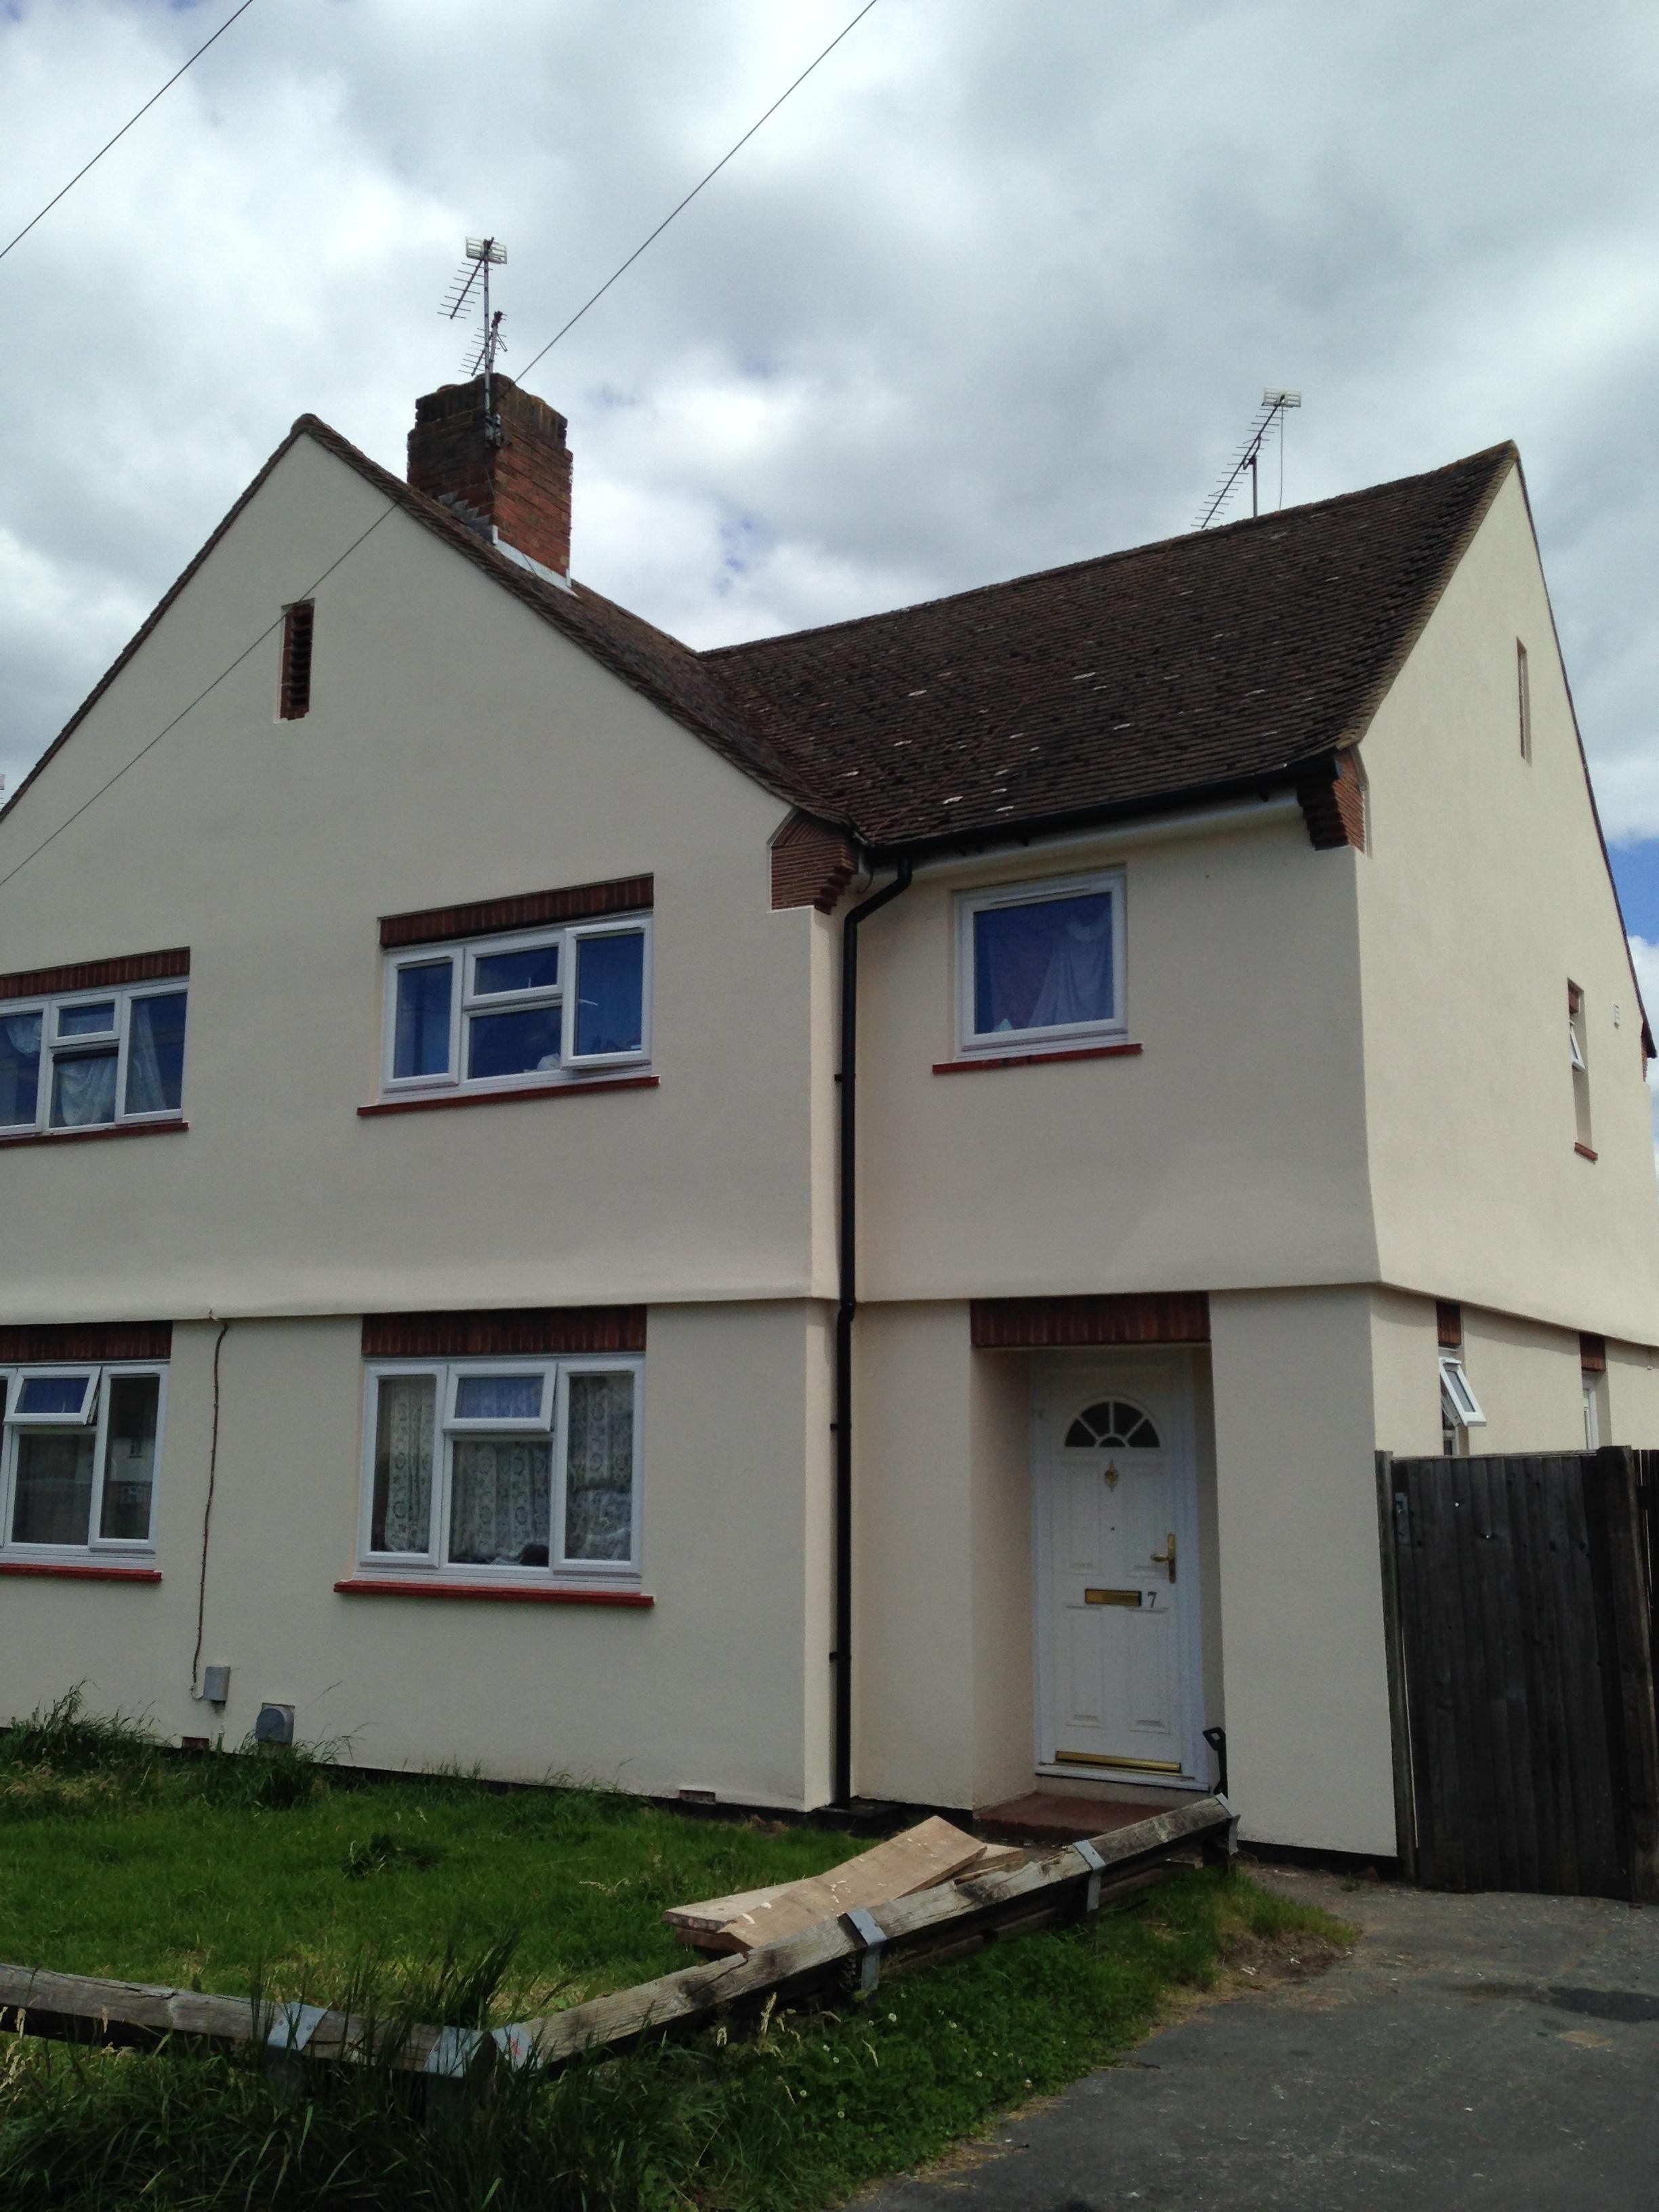 New Vision Homes- Woking. Housing Association Refurbishment Works